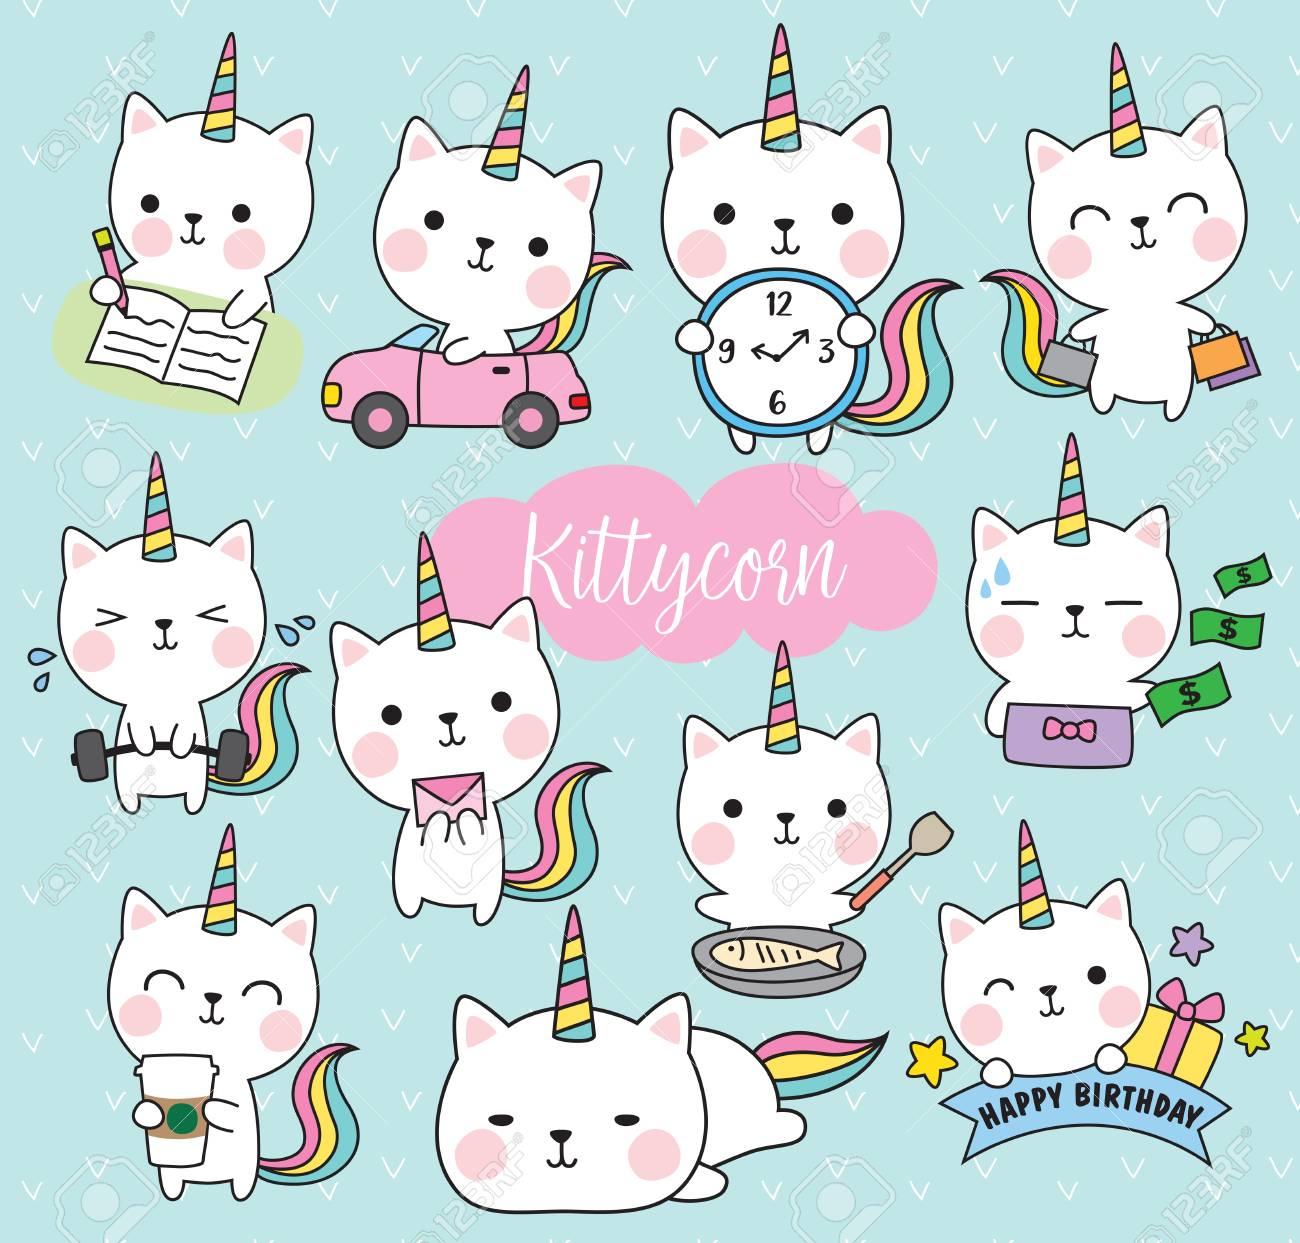 Vector illustration of cute white cat unicorn - 96790501